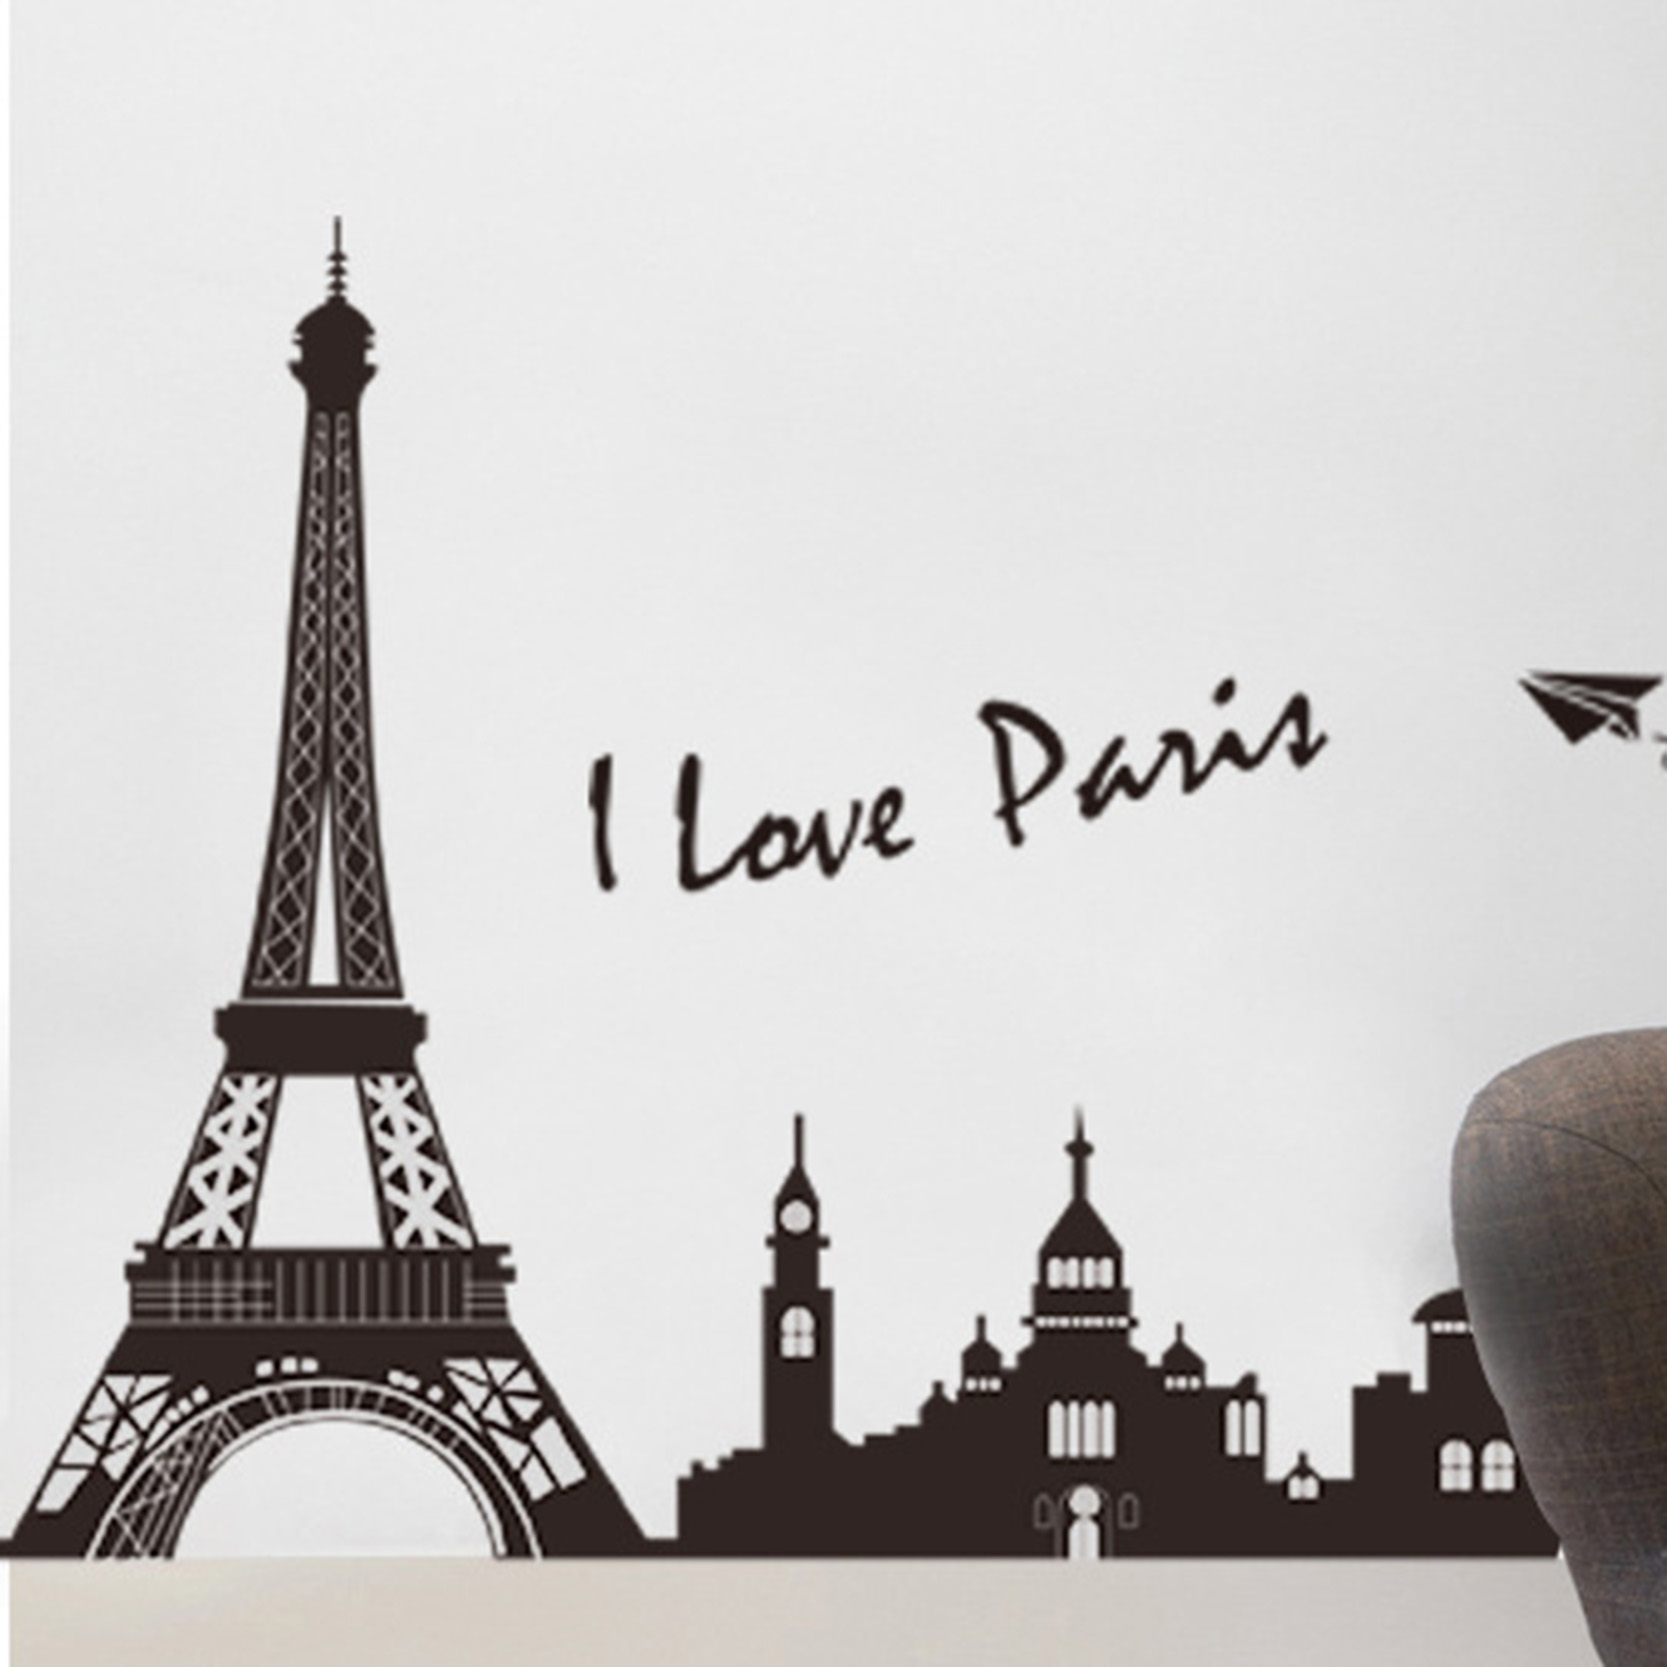 Eiffel Tower Bedroom Decor Online Get Cheap Eiffel Tower Room Decor Aliexpresscom Alibaba